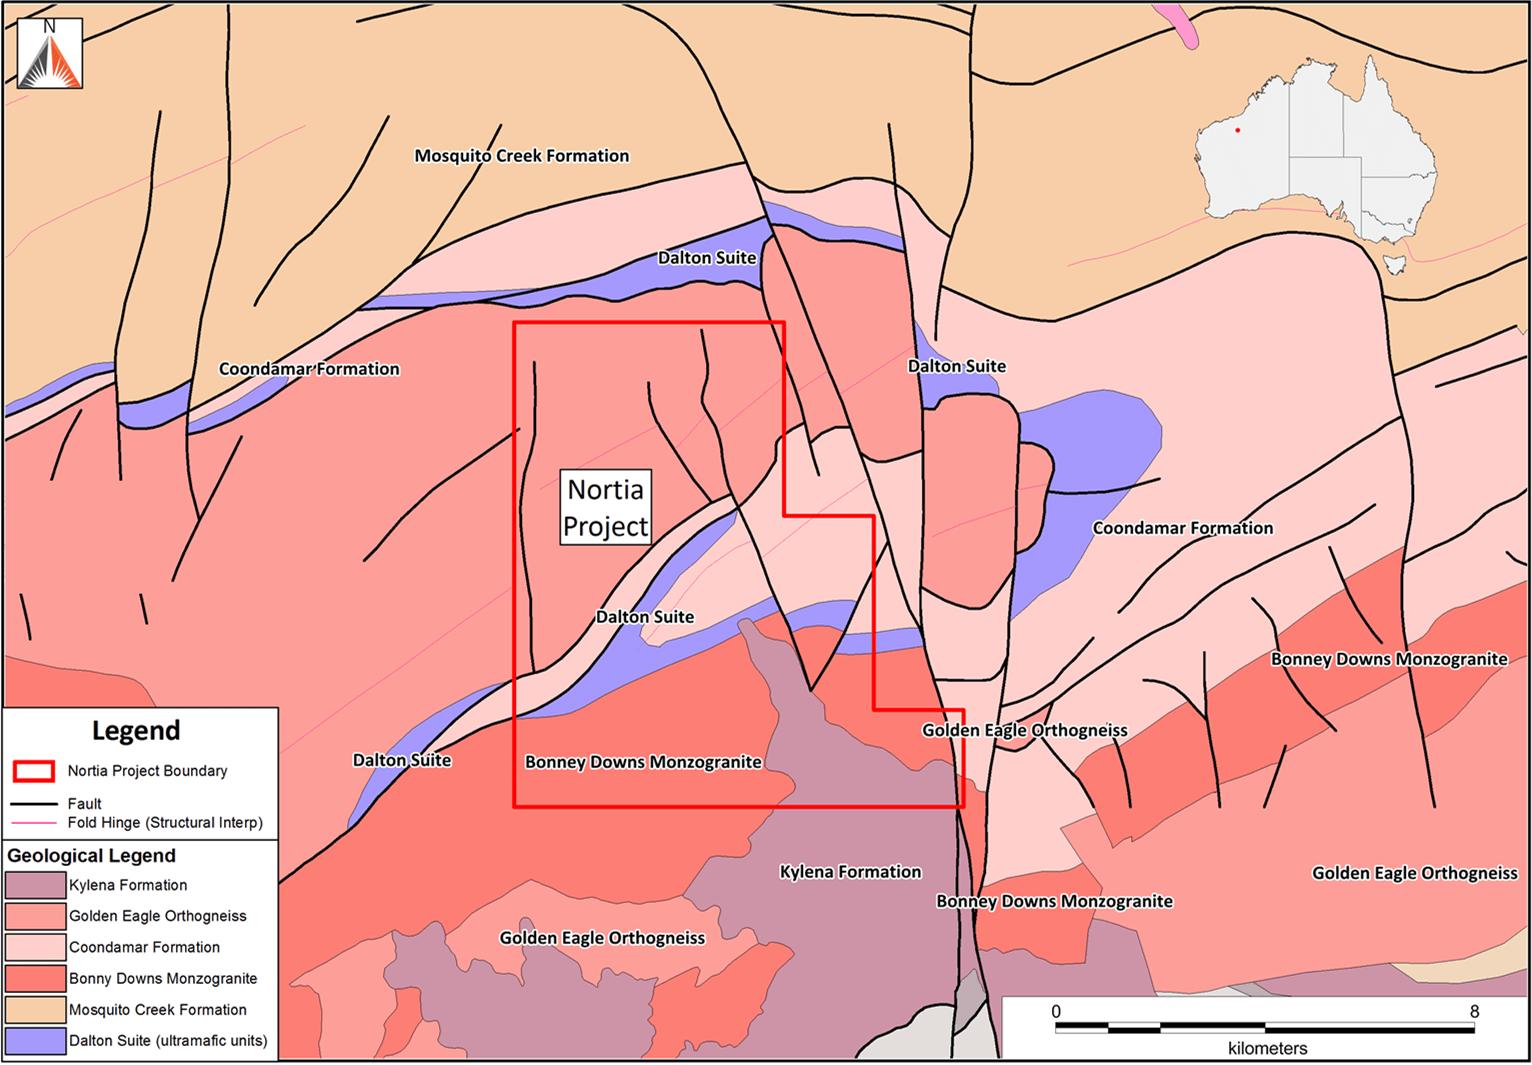 Nortia Project - gold mine in Western Australia's Pilbara region